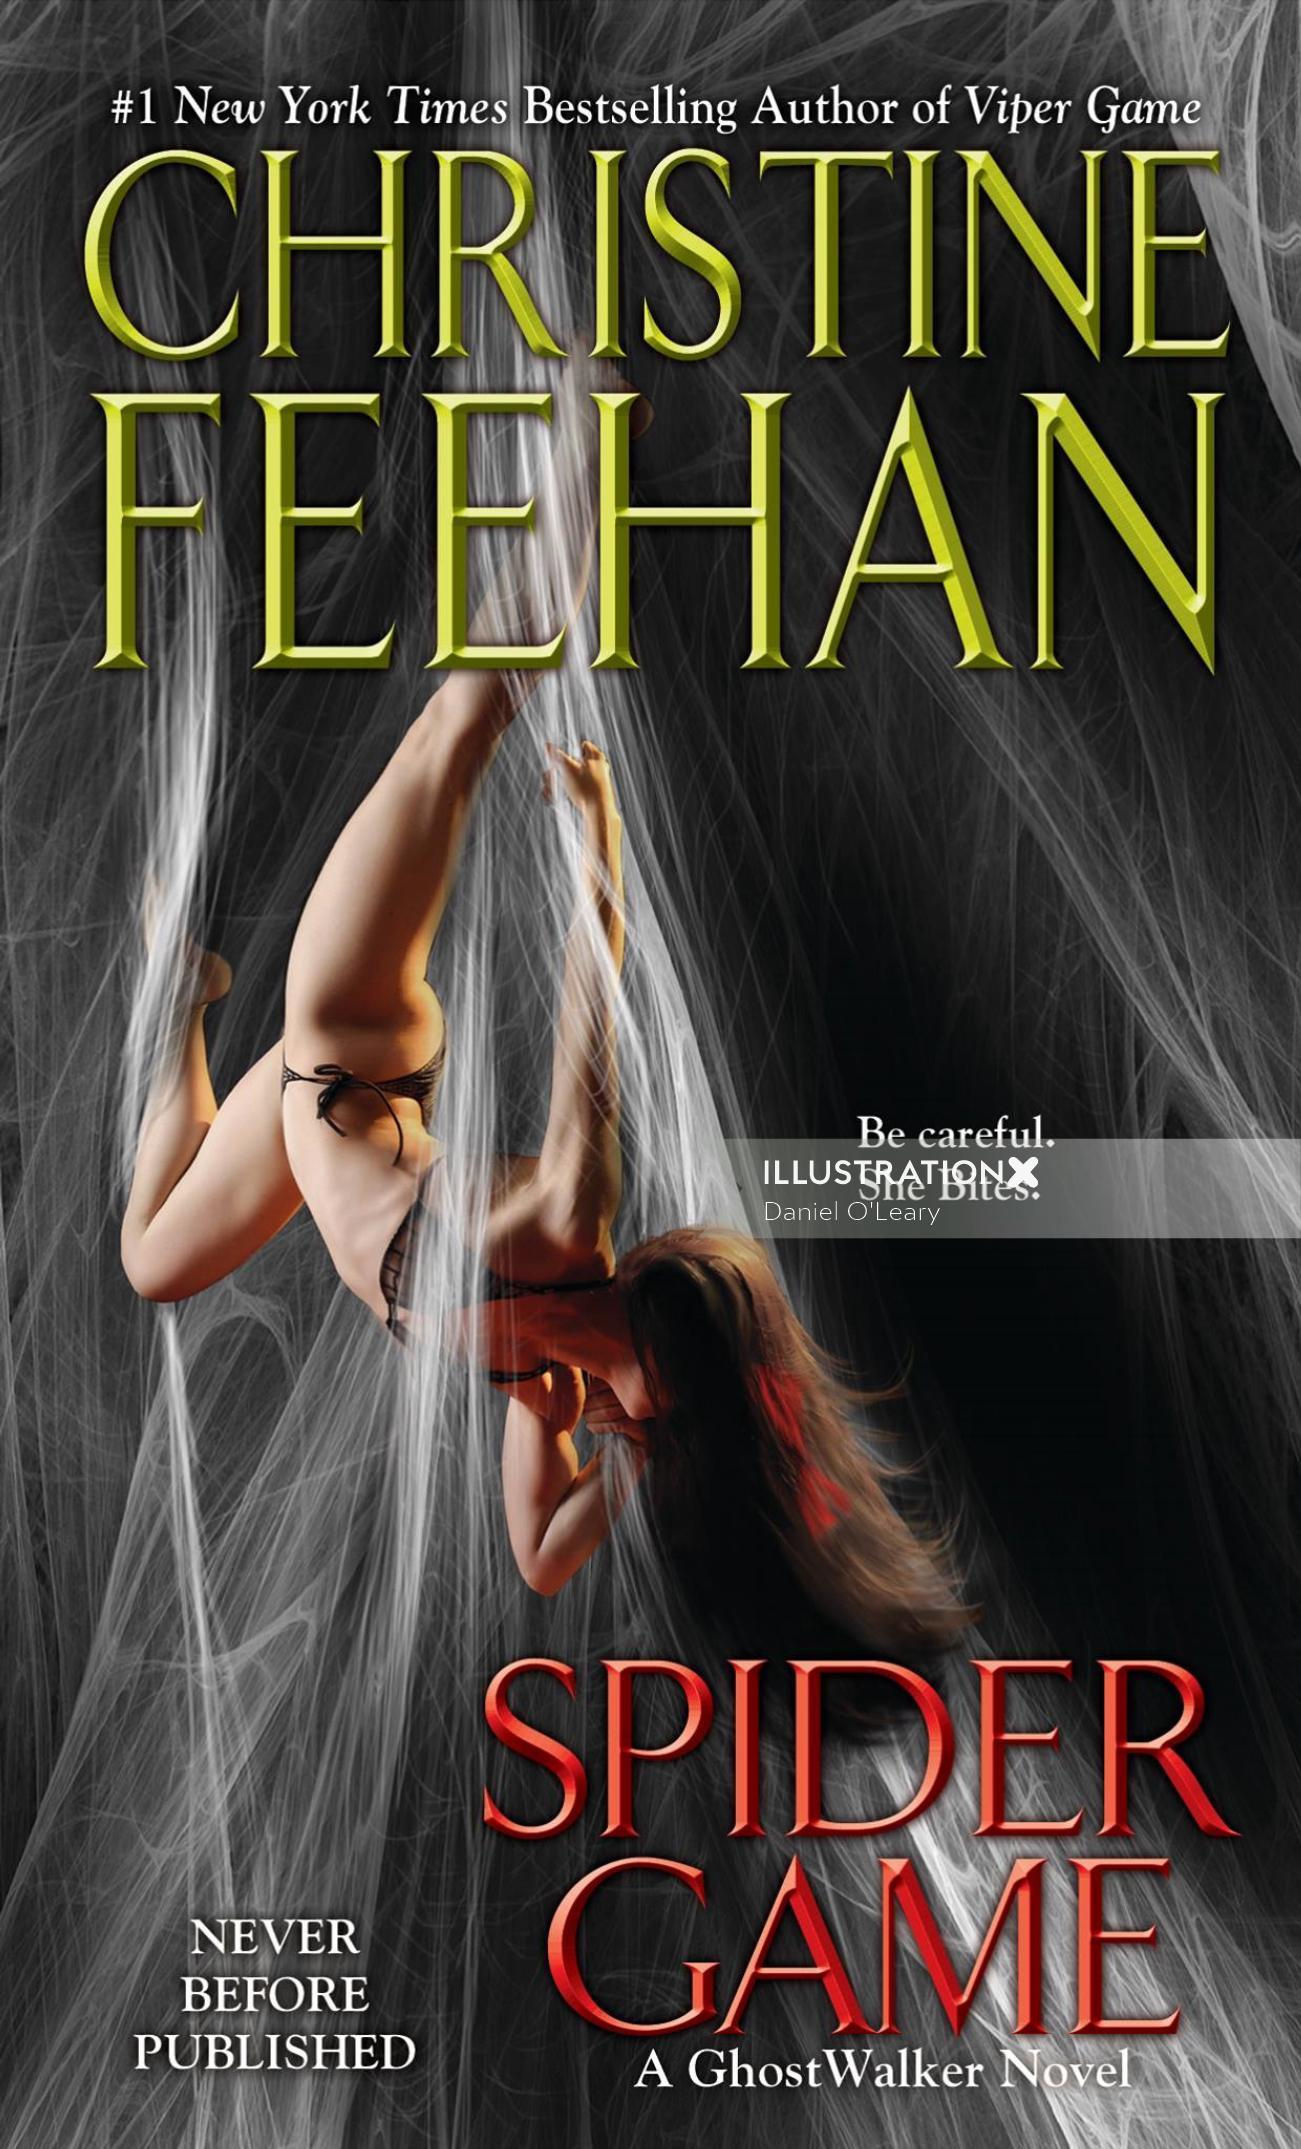 Spider game book cover illustration